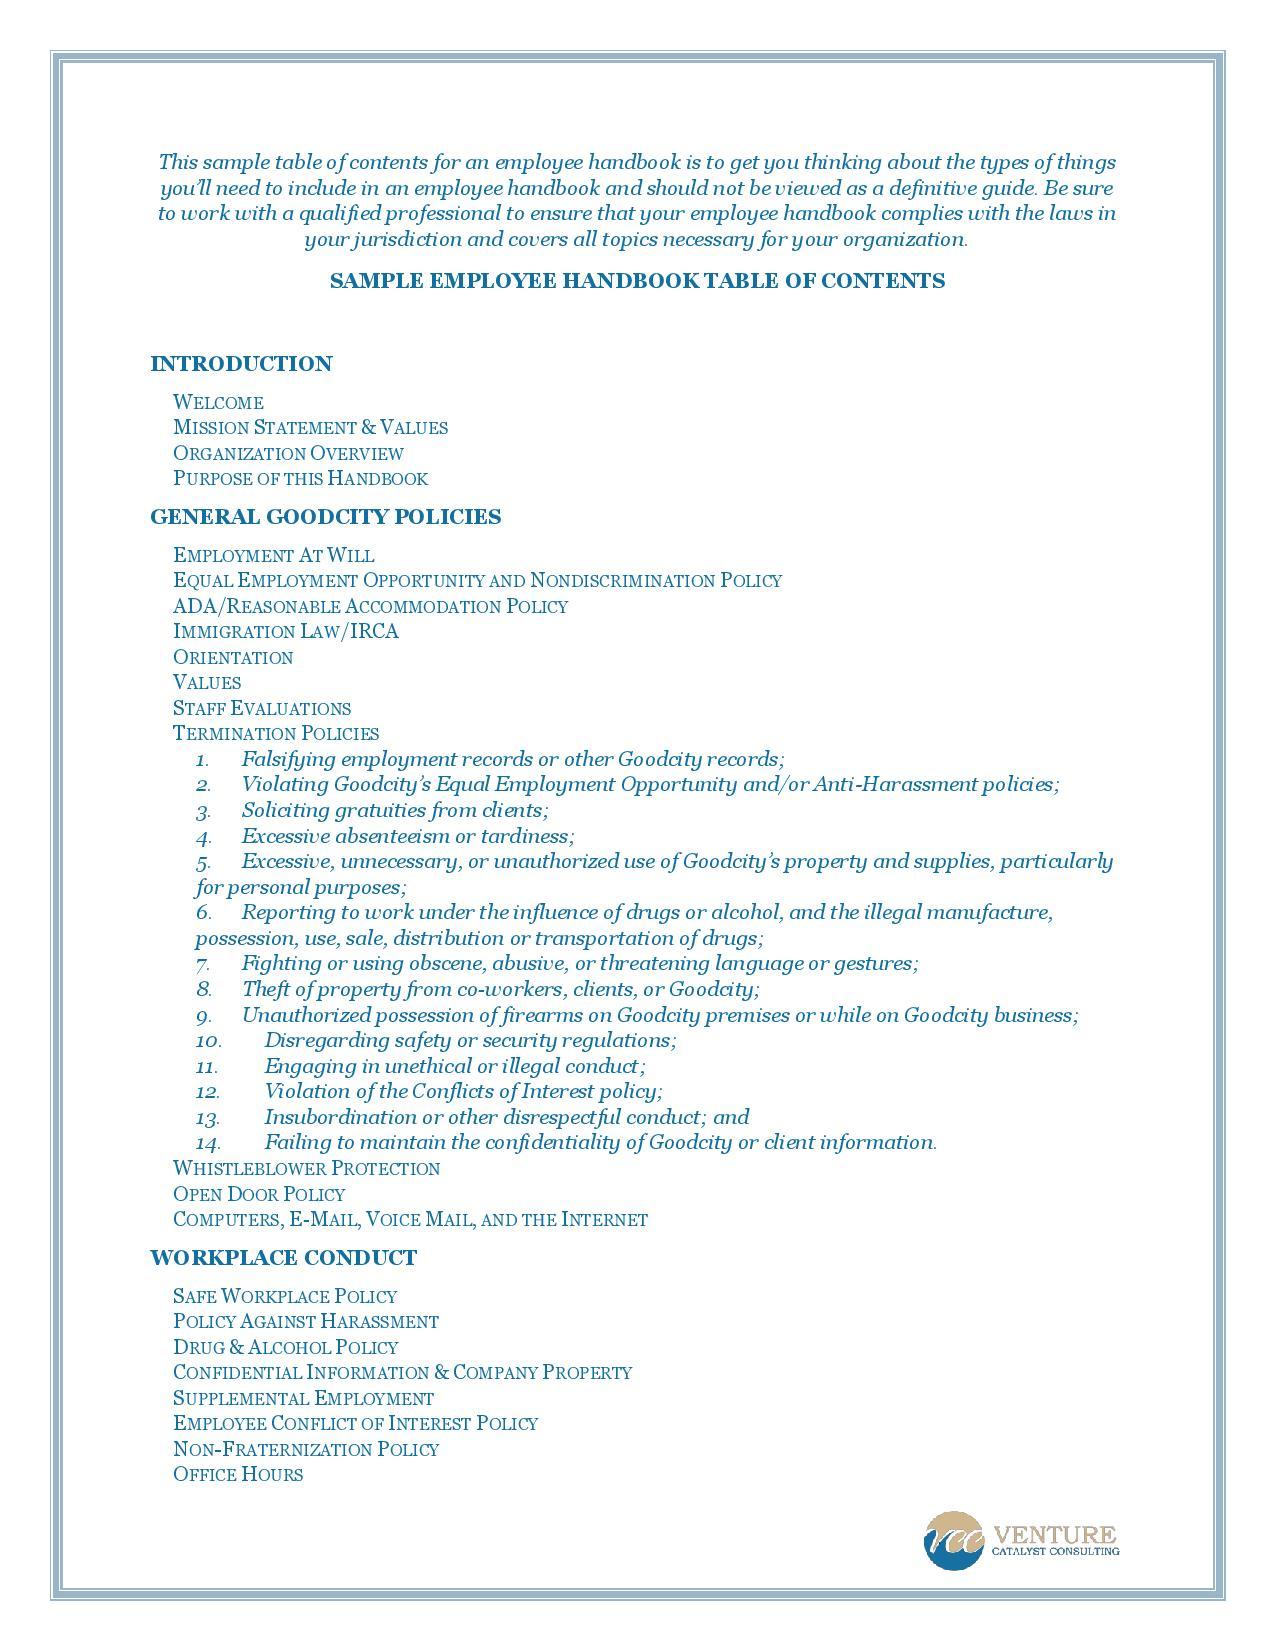 employee handbook nondiscrimination section